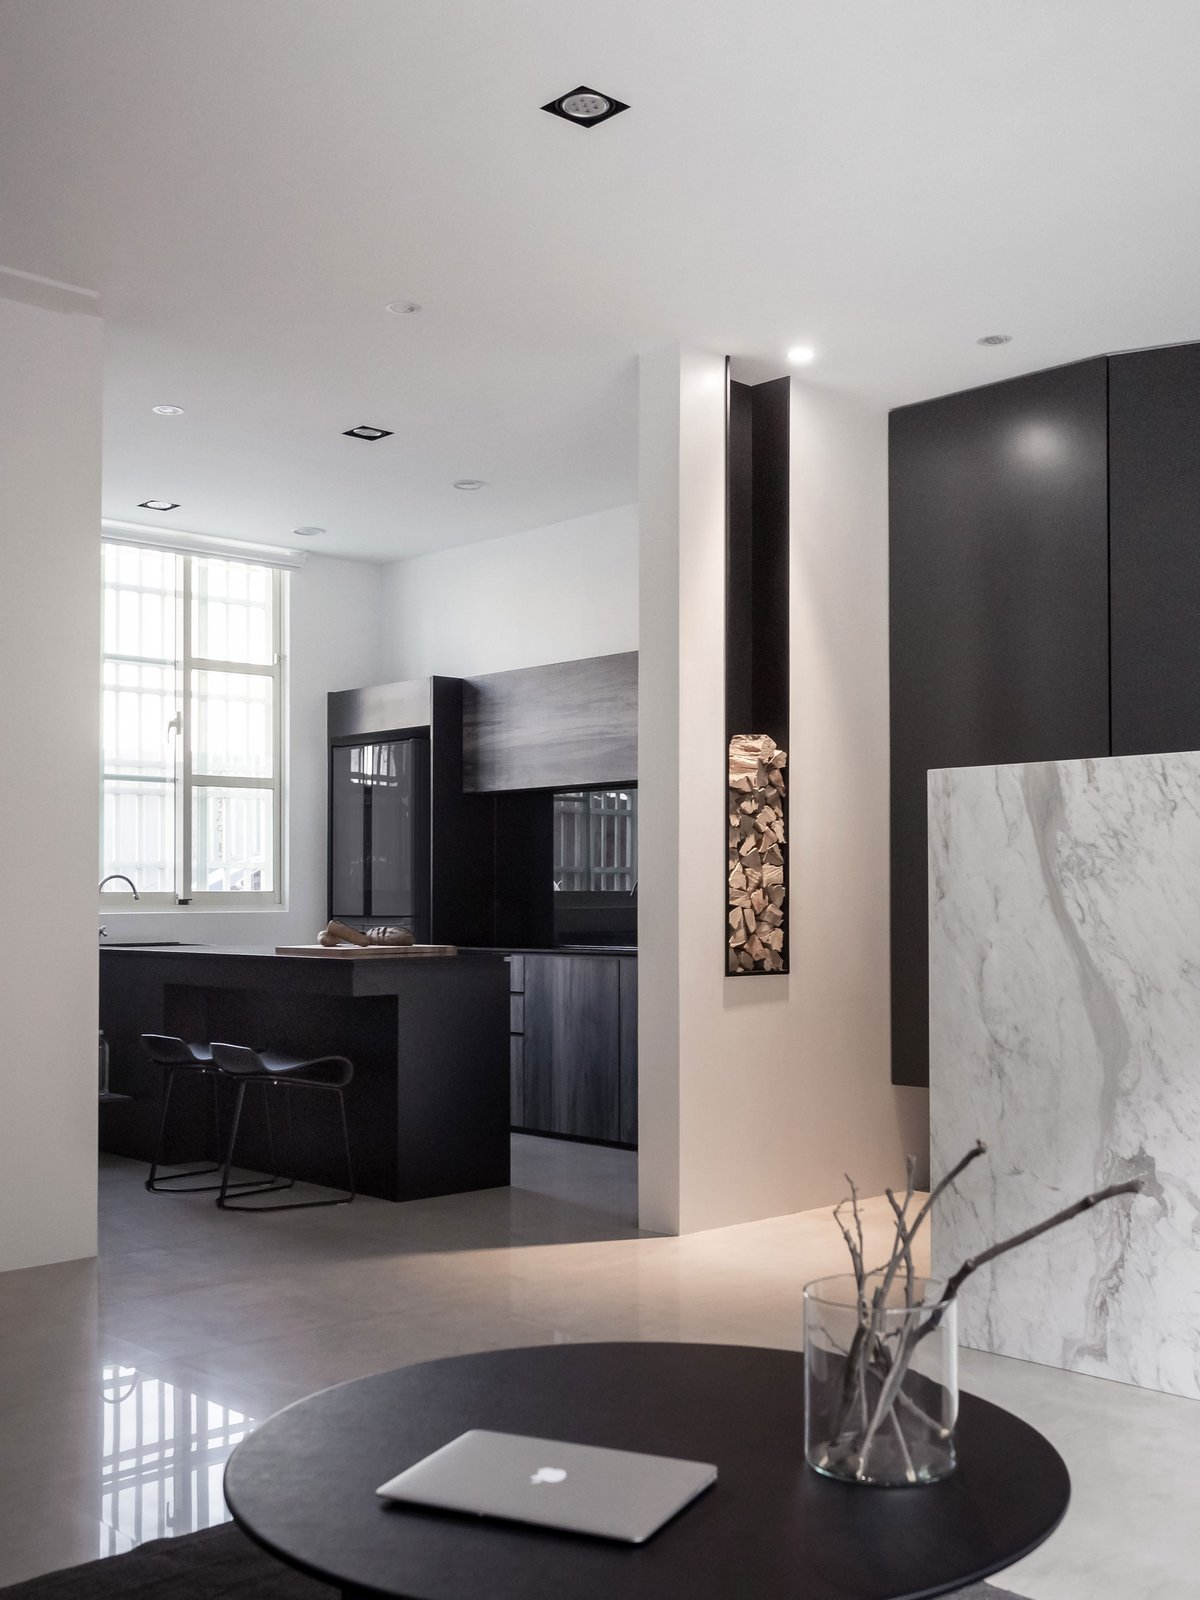 Z-AXIS DESIGN, Guo's Residence, интерьер минимализм фото, стильный интерьер фото, мужской дизайн интерьера квартиры, Тайчжун, Тайвань